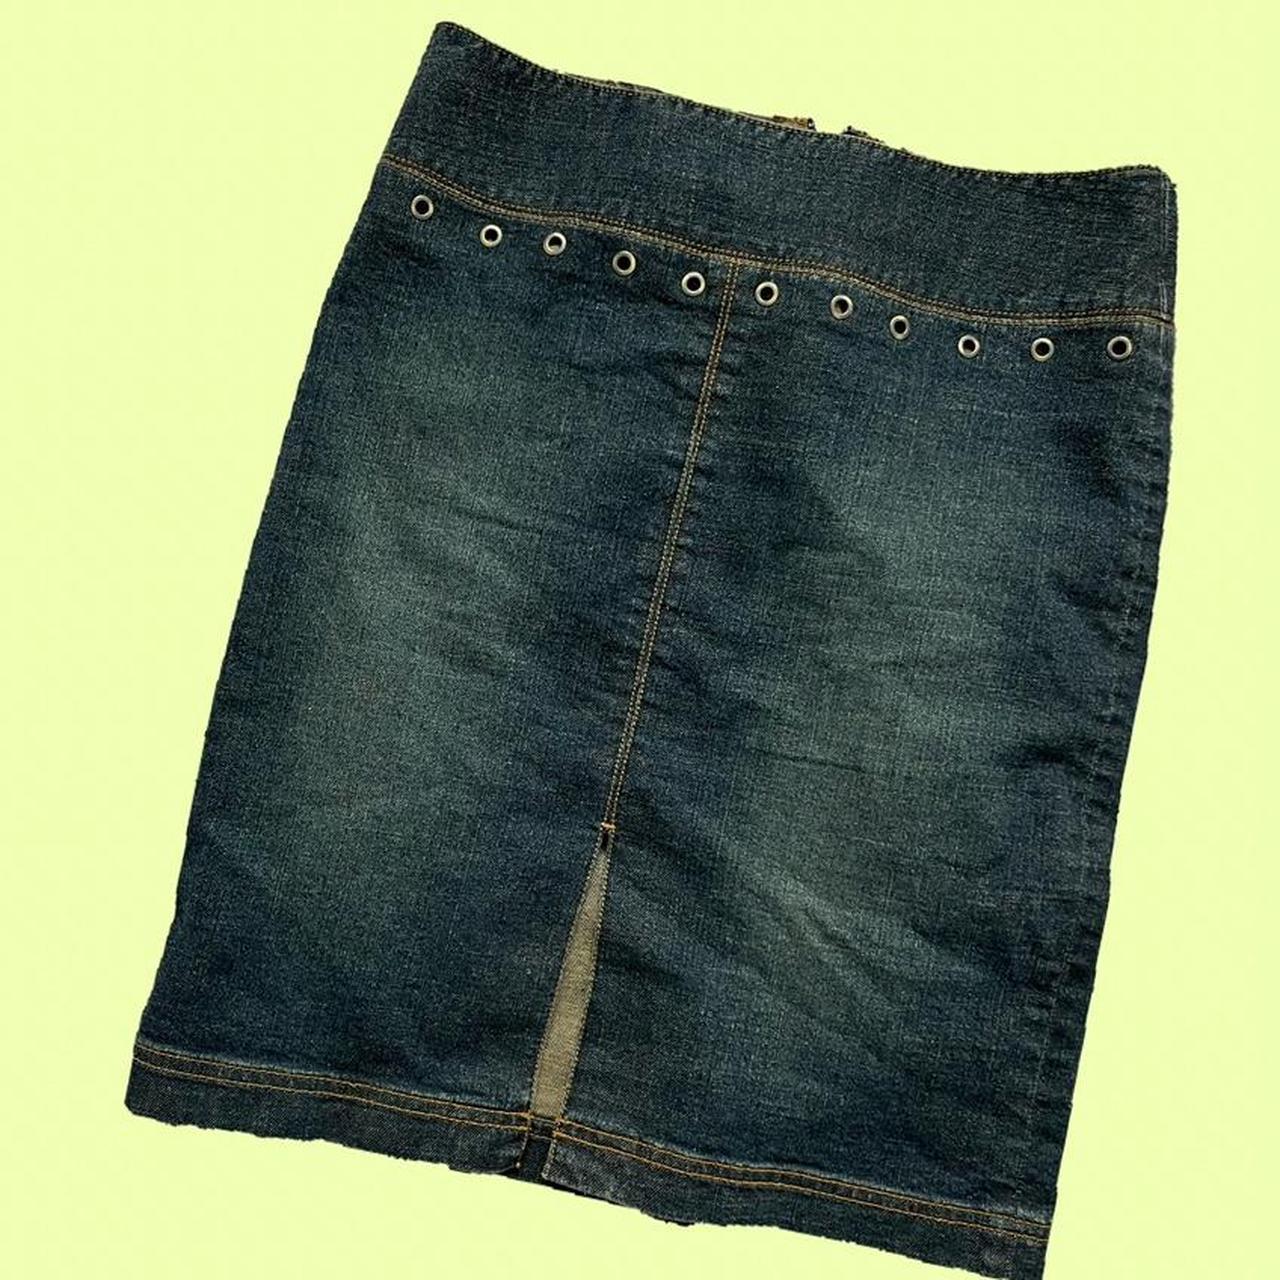 Product Image 1 - 🧸vintage denim skirt  🧸brand : classiques